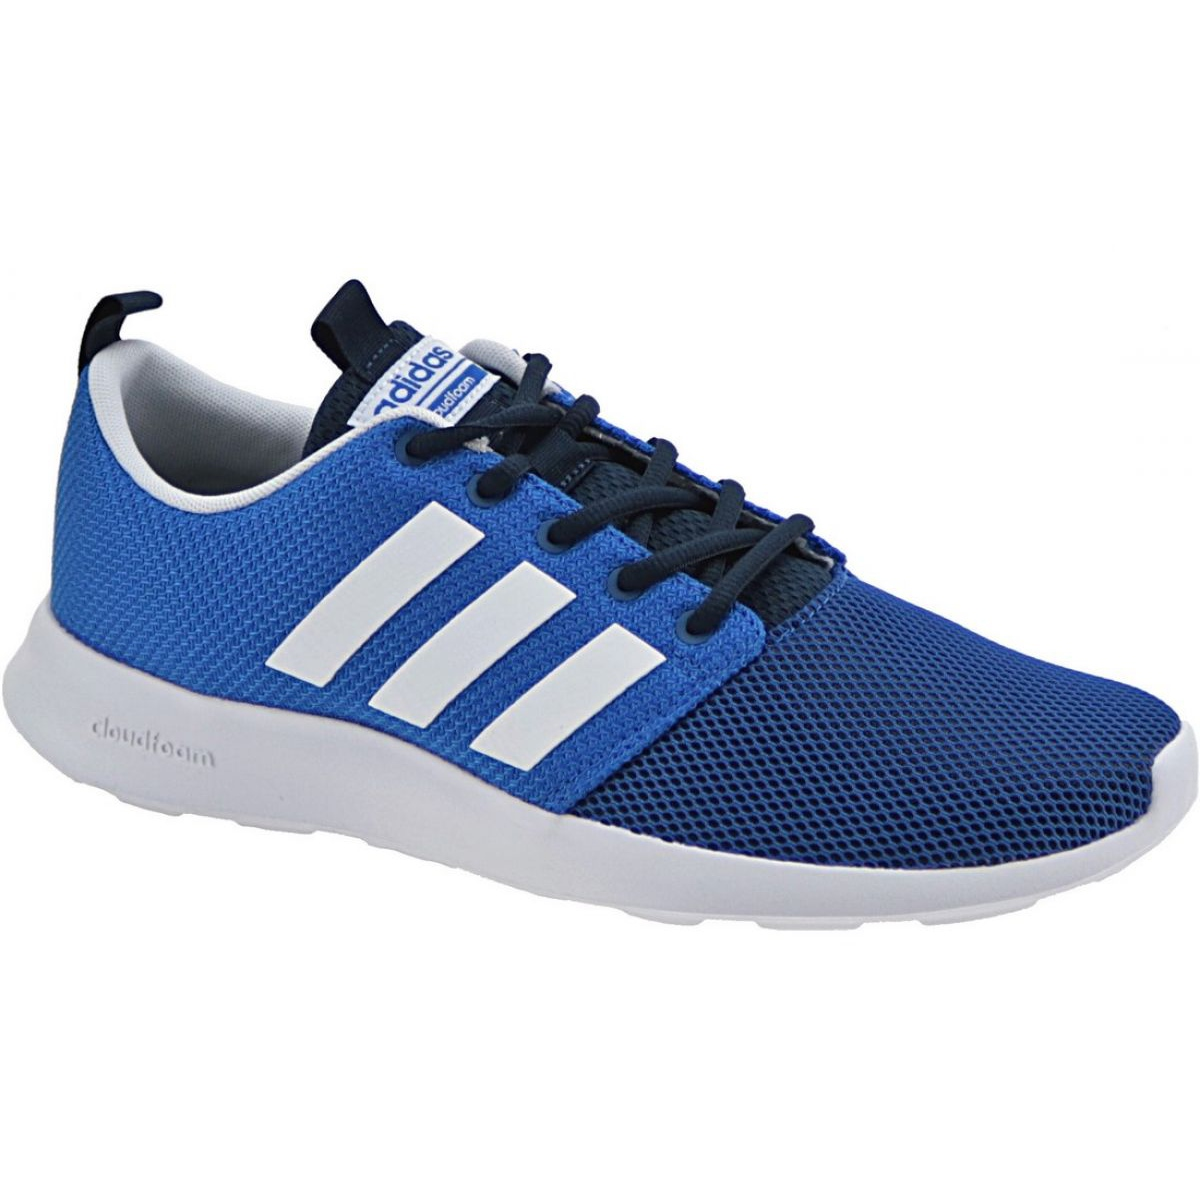 Adidas Cloudfoam Swift M AW4155 shoes blue